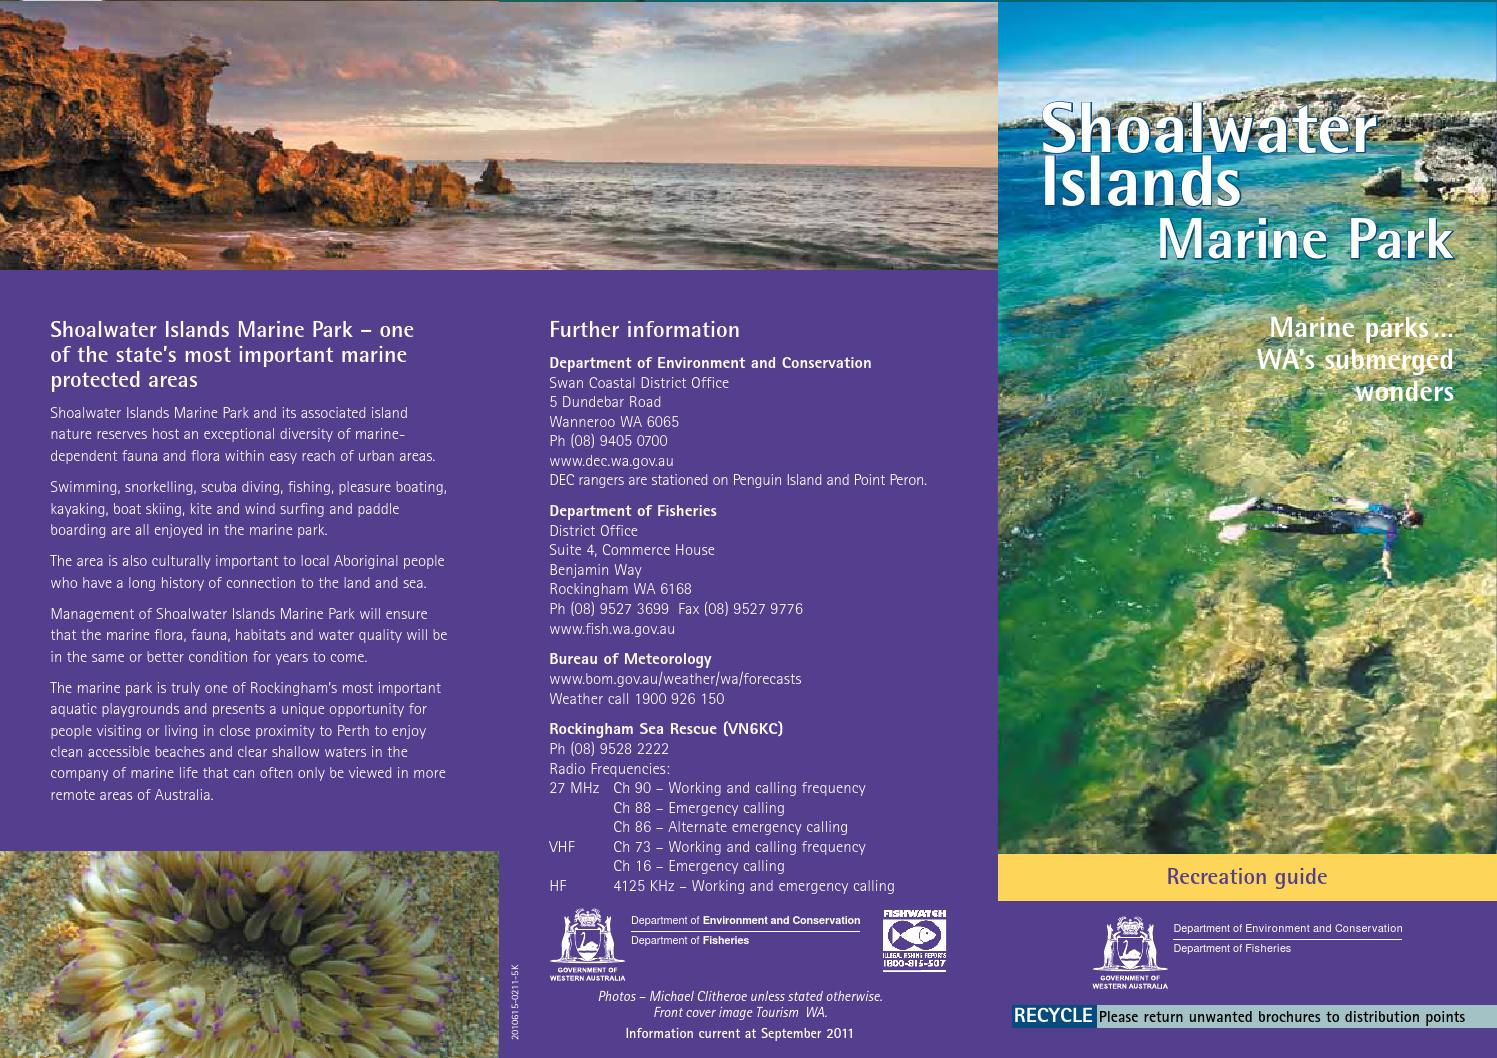 Shoalwater Islands Marine Park, Perth, Western Australia  by